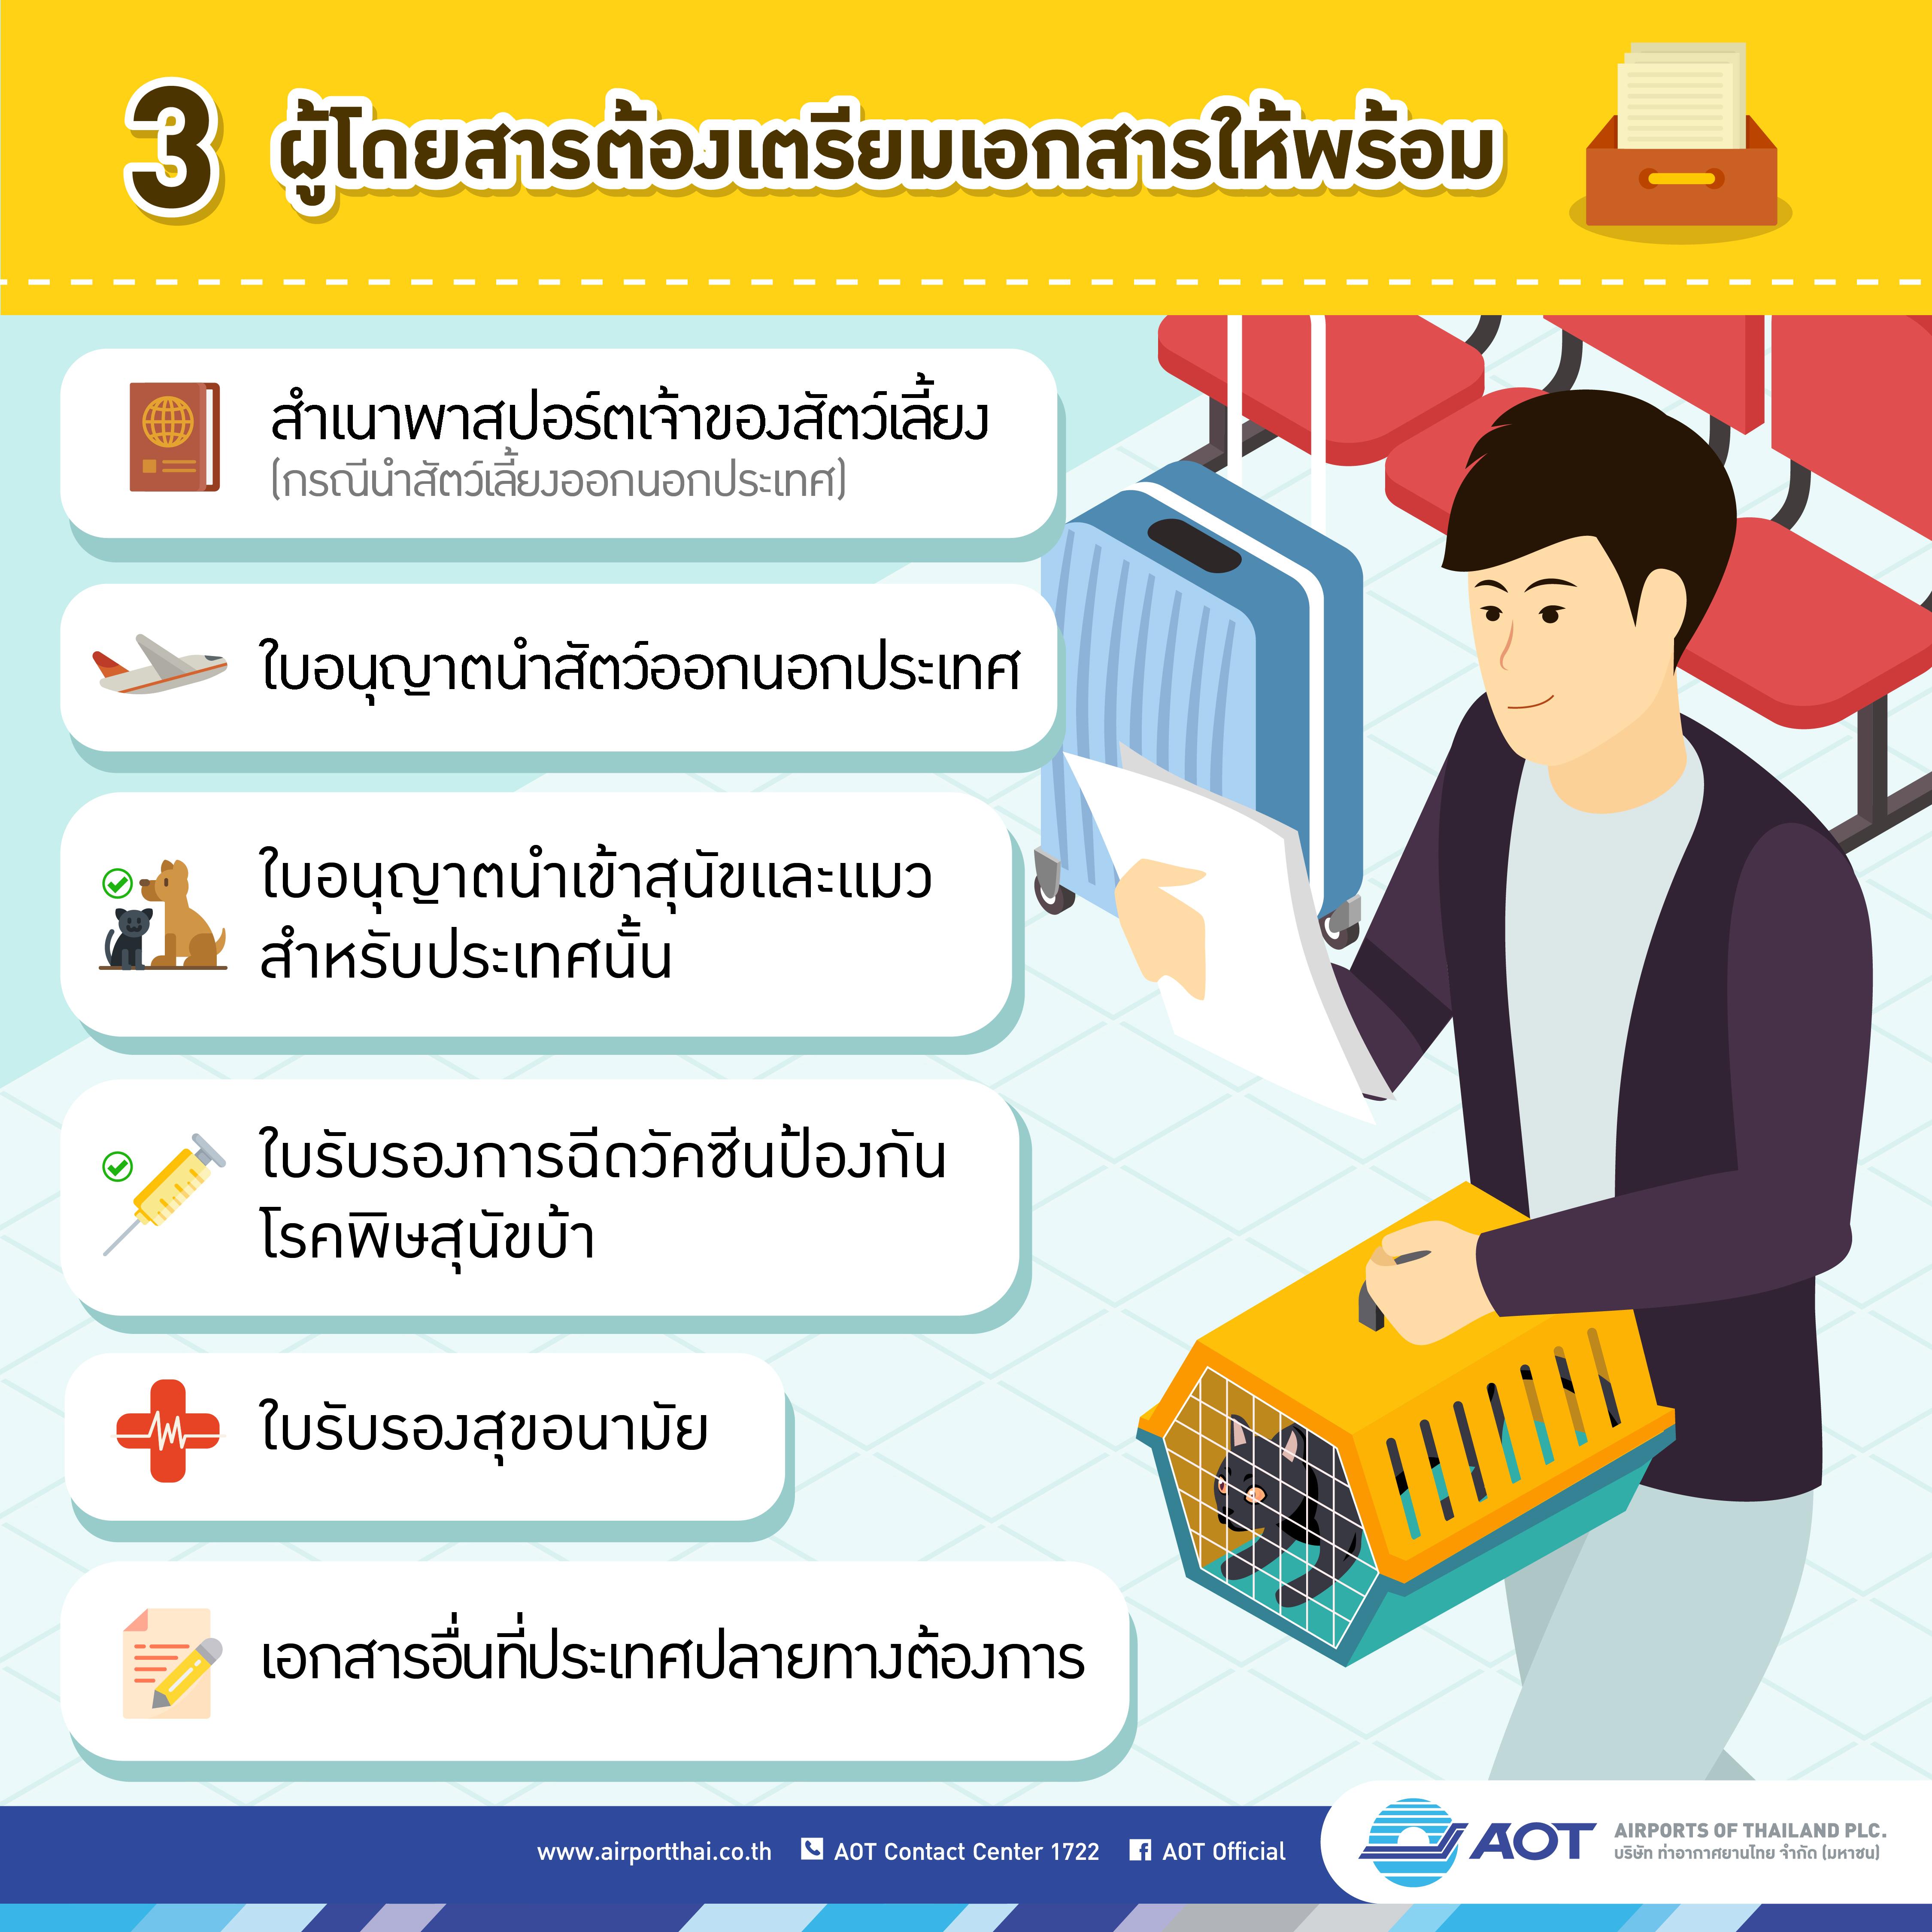 AOTcontent2019_Infographic_17_วิธีการนำสัตว์เลี้ยงร่วมเดินทางโดยเครื่องบิน_V2_20190805_Page-04